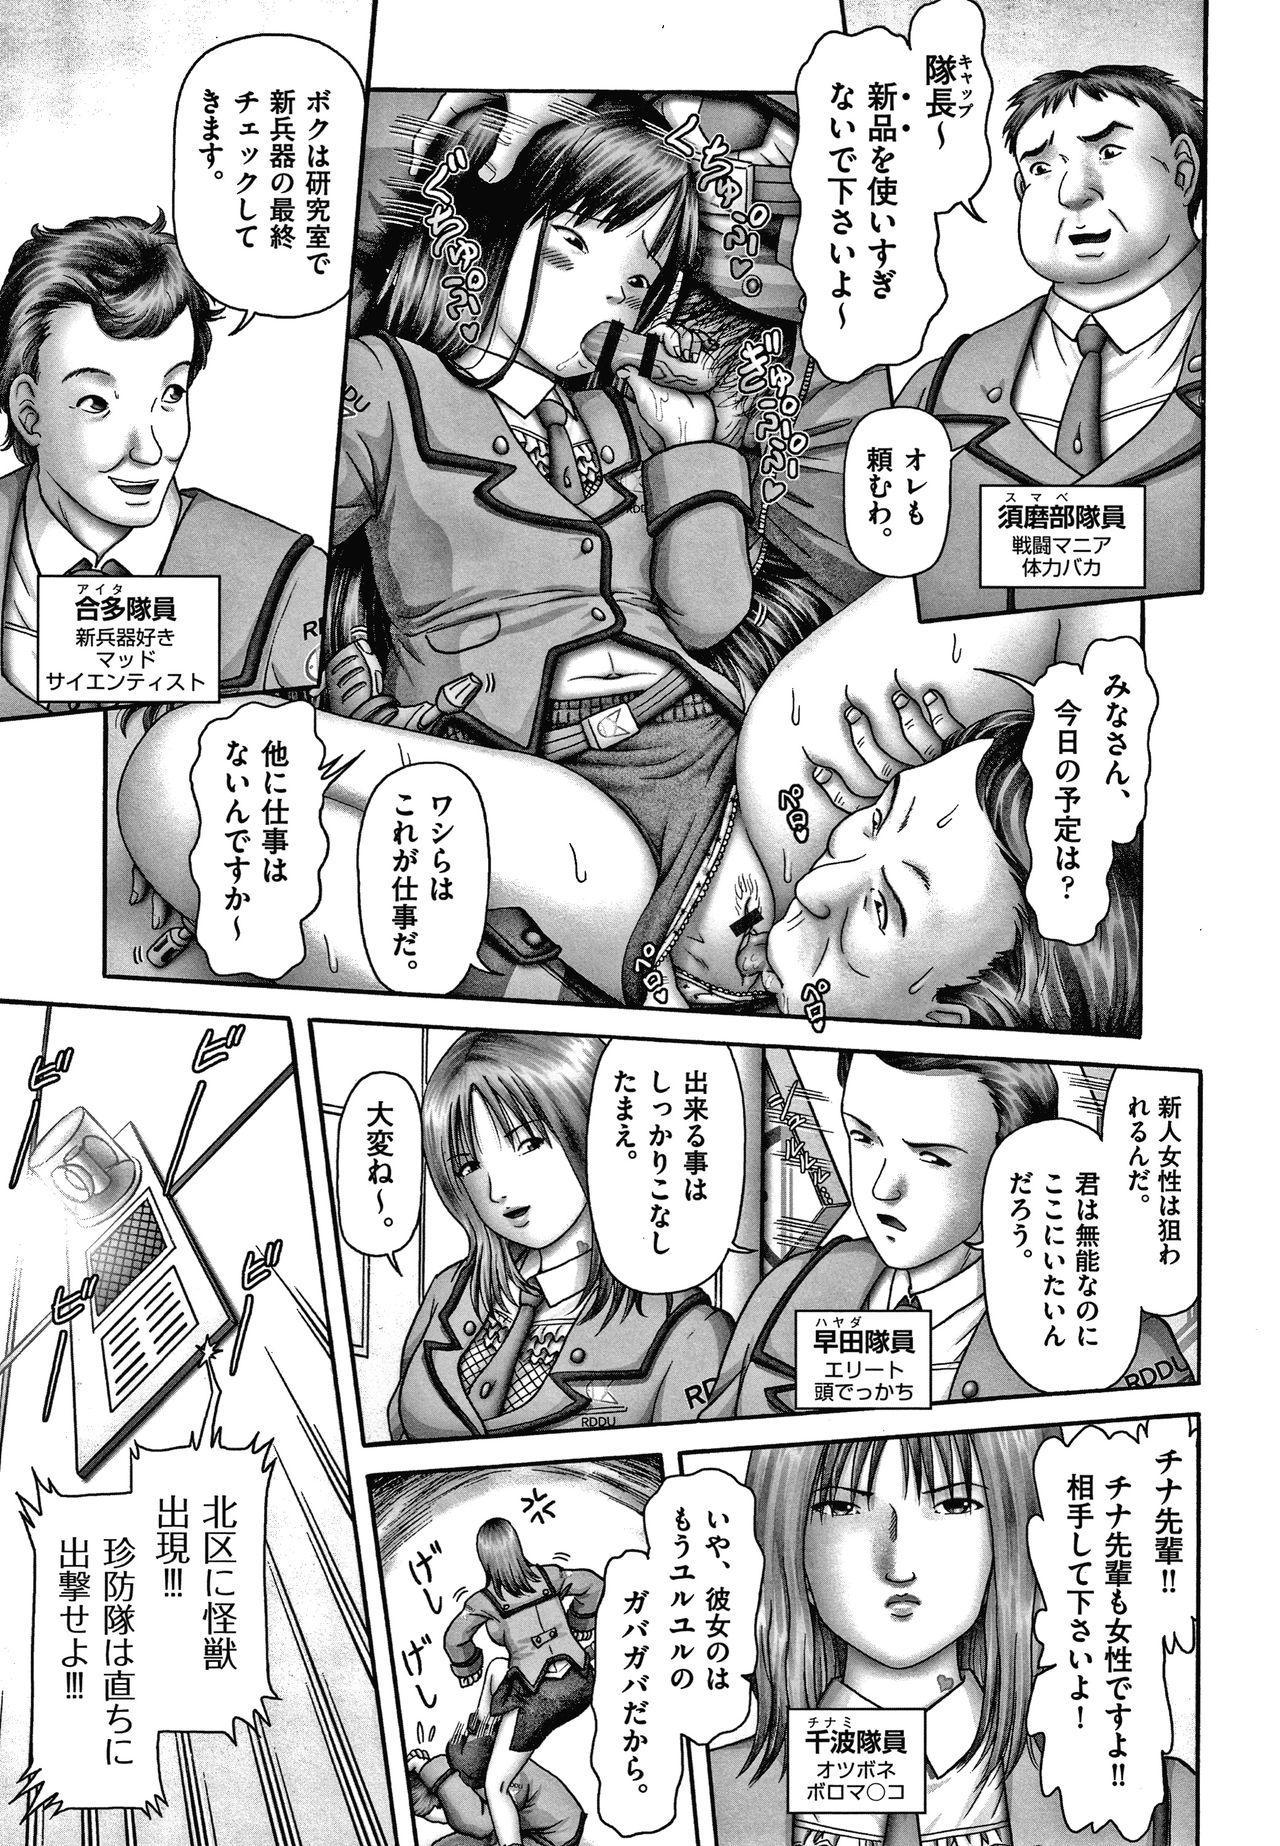 Shoujo Kumikyoku 15 67